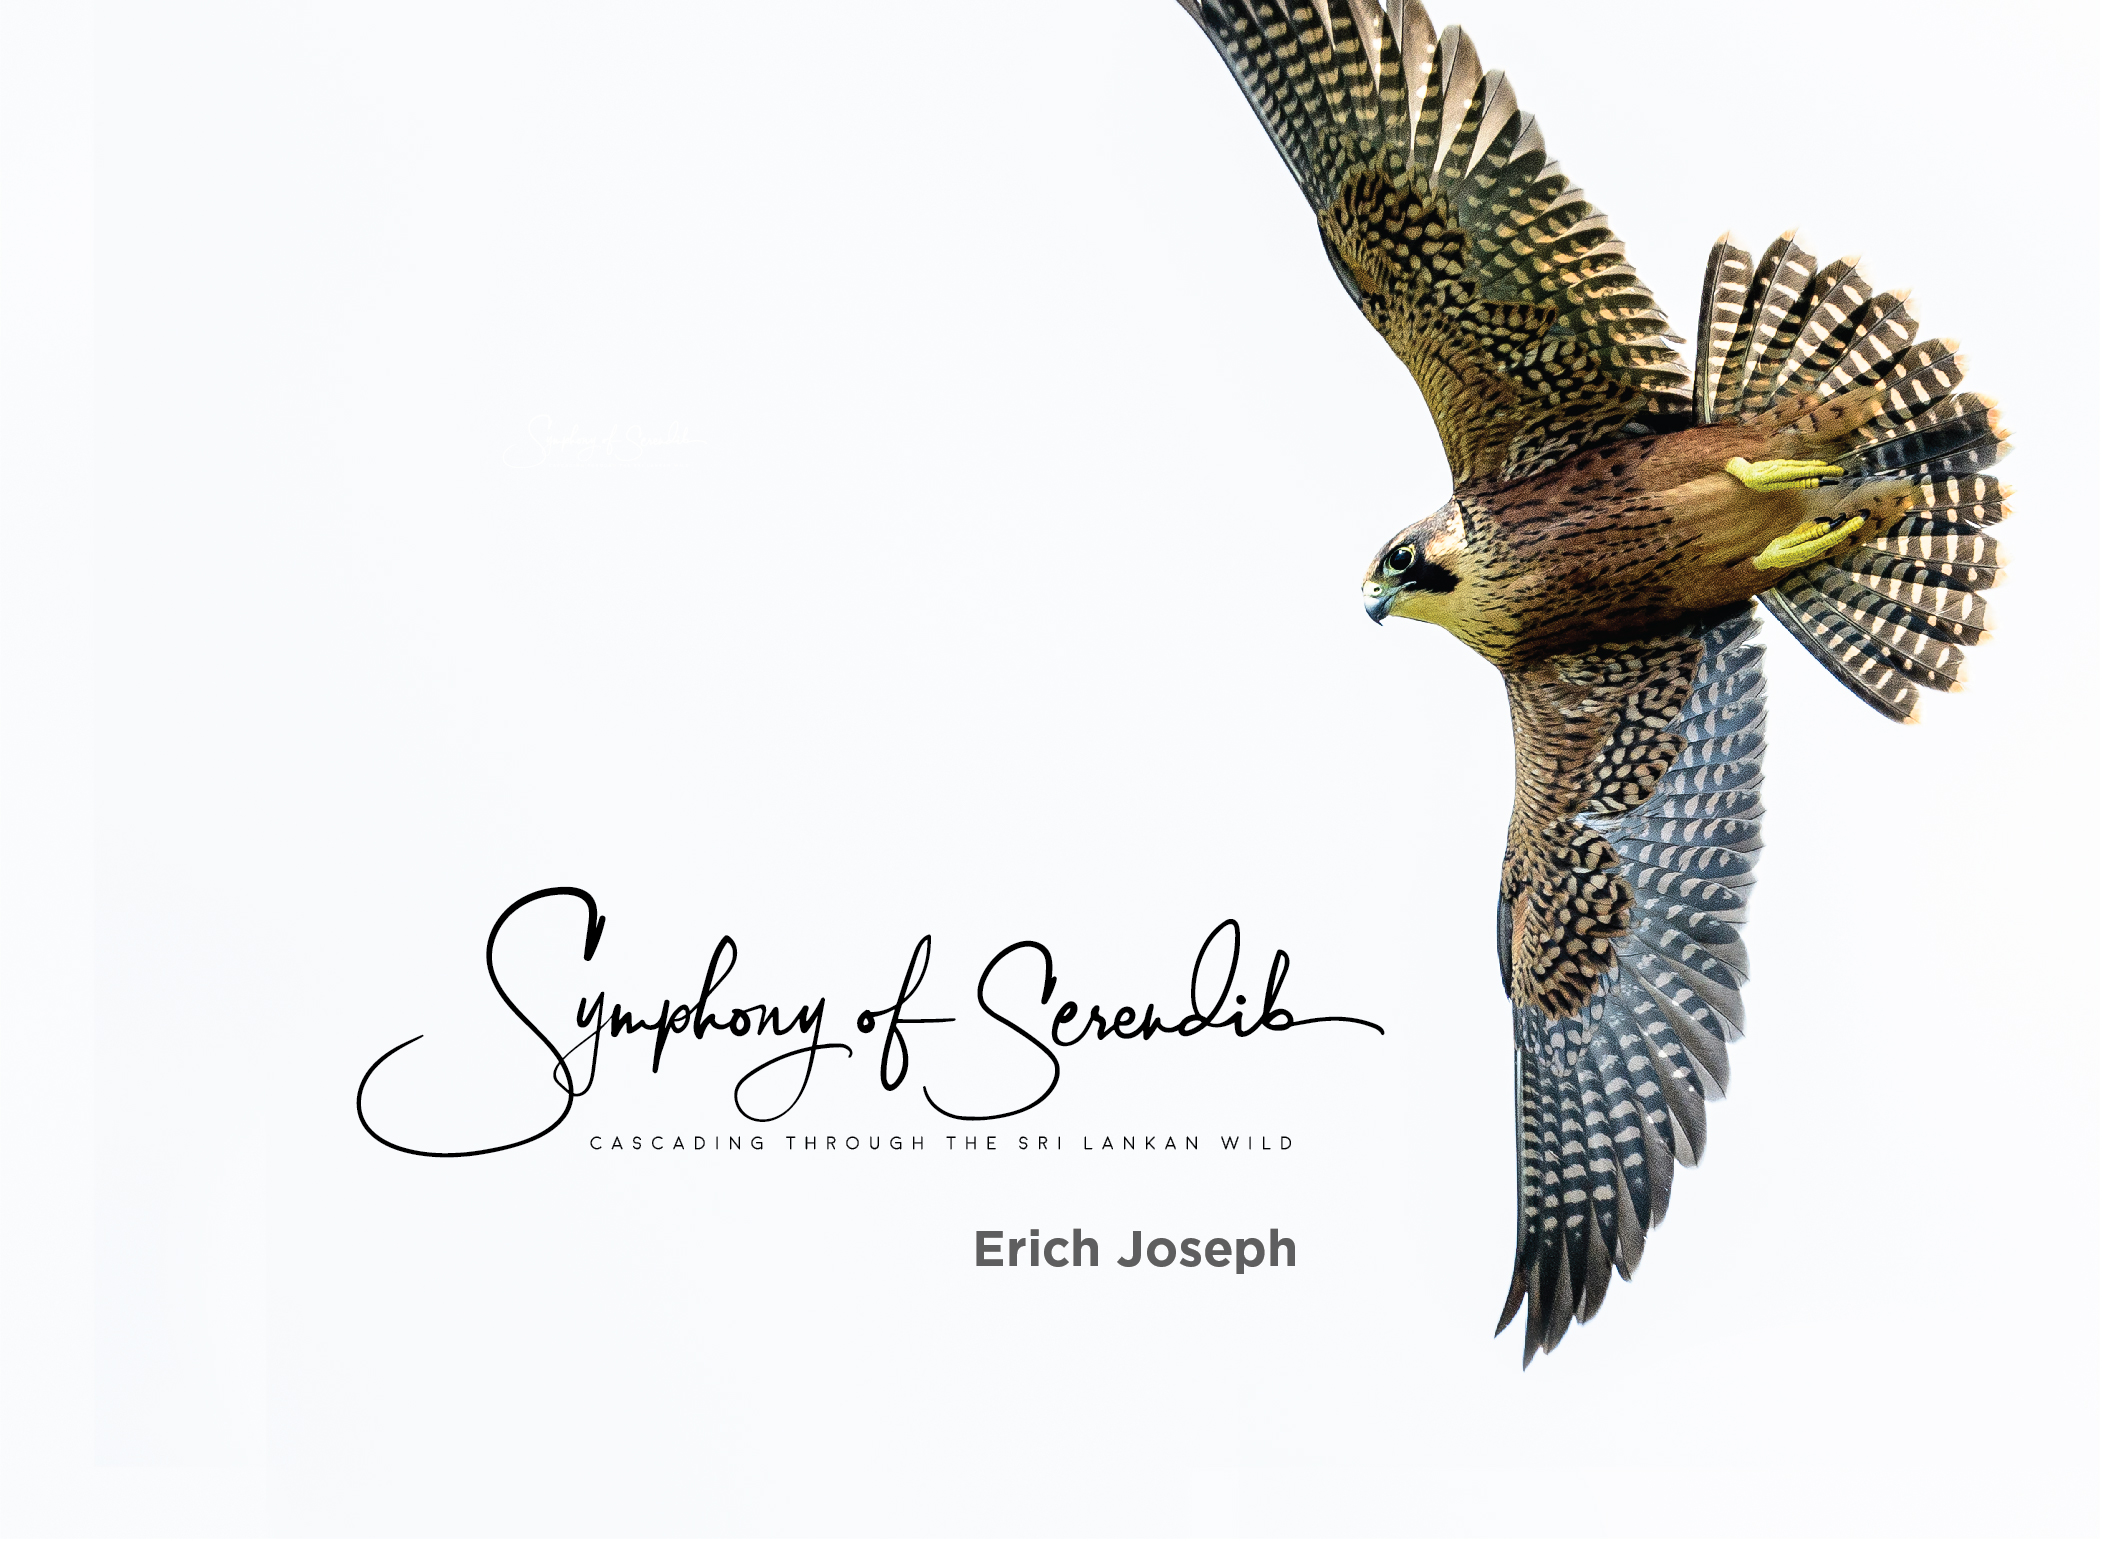 Symphony of Serendib